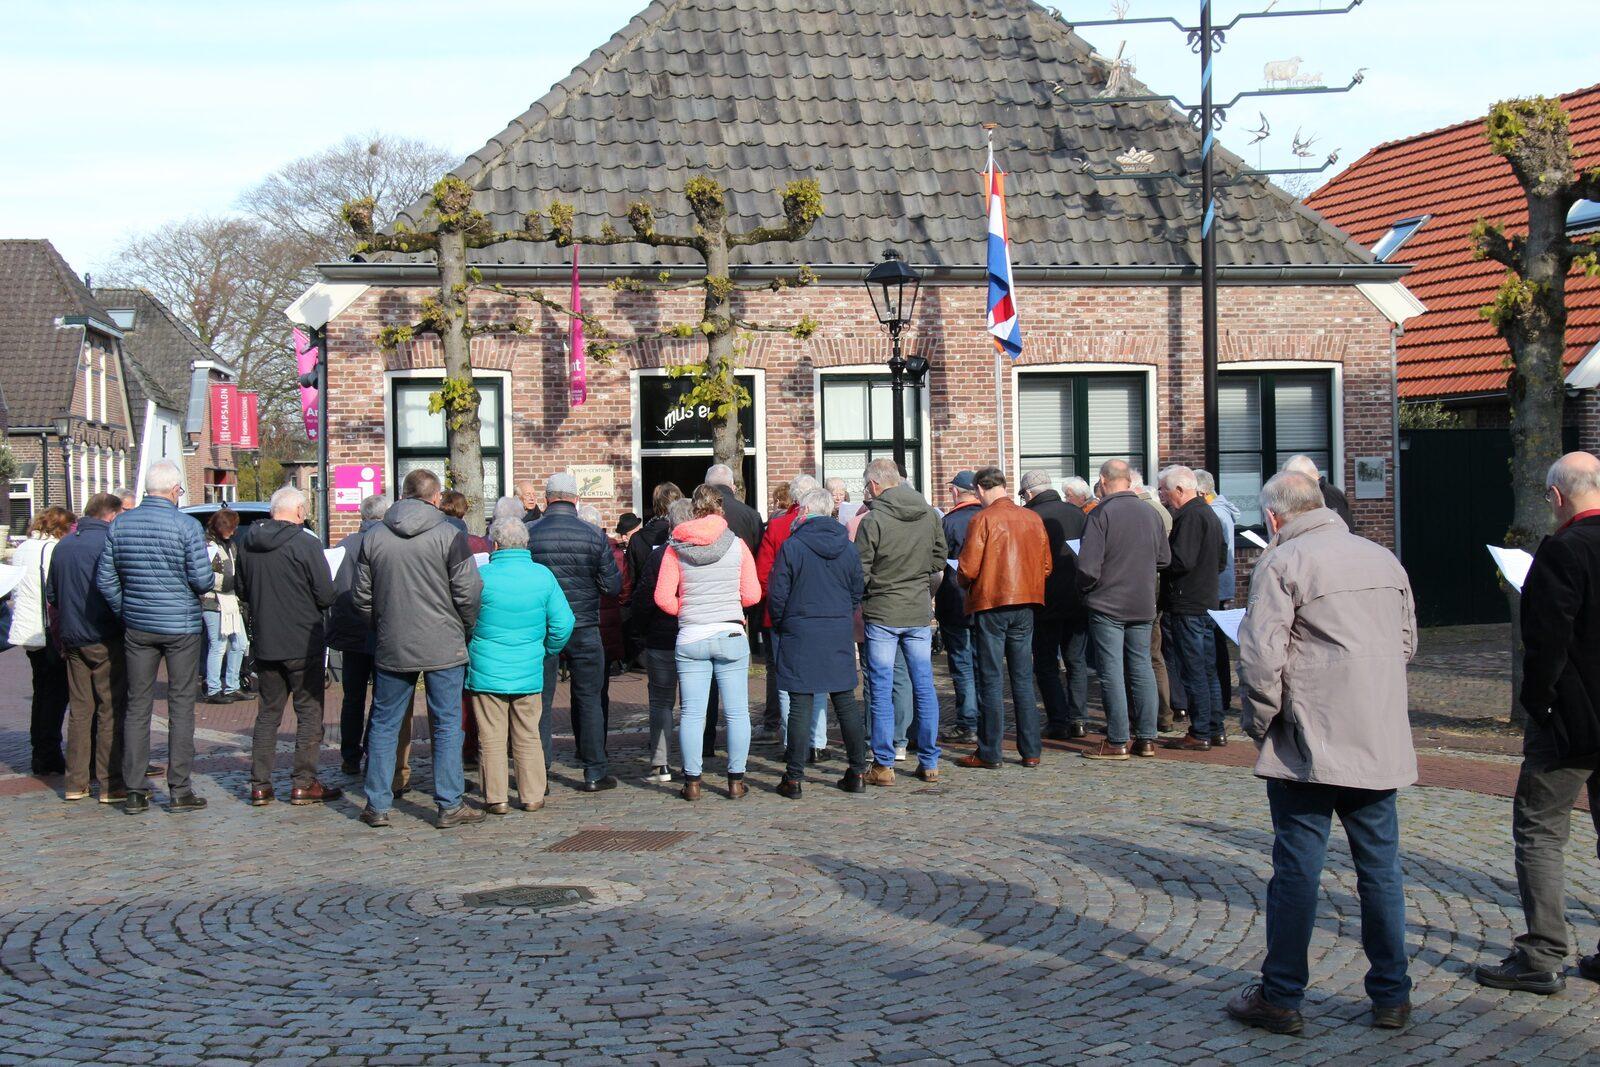 Historisch Cultureel Infocentrum Vechtdal